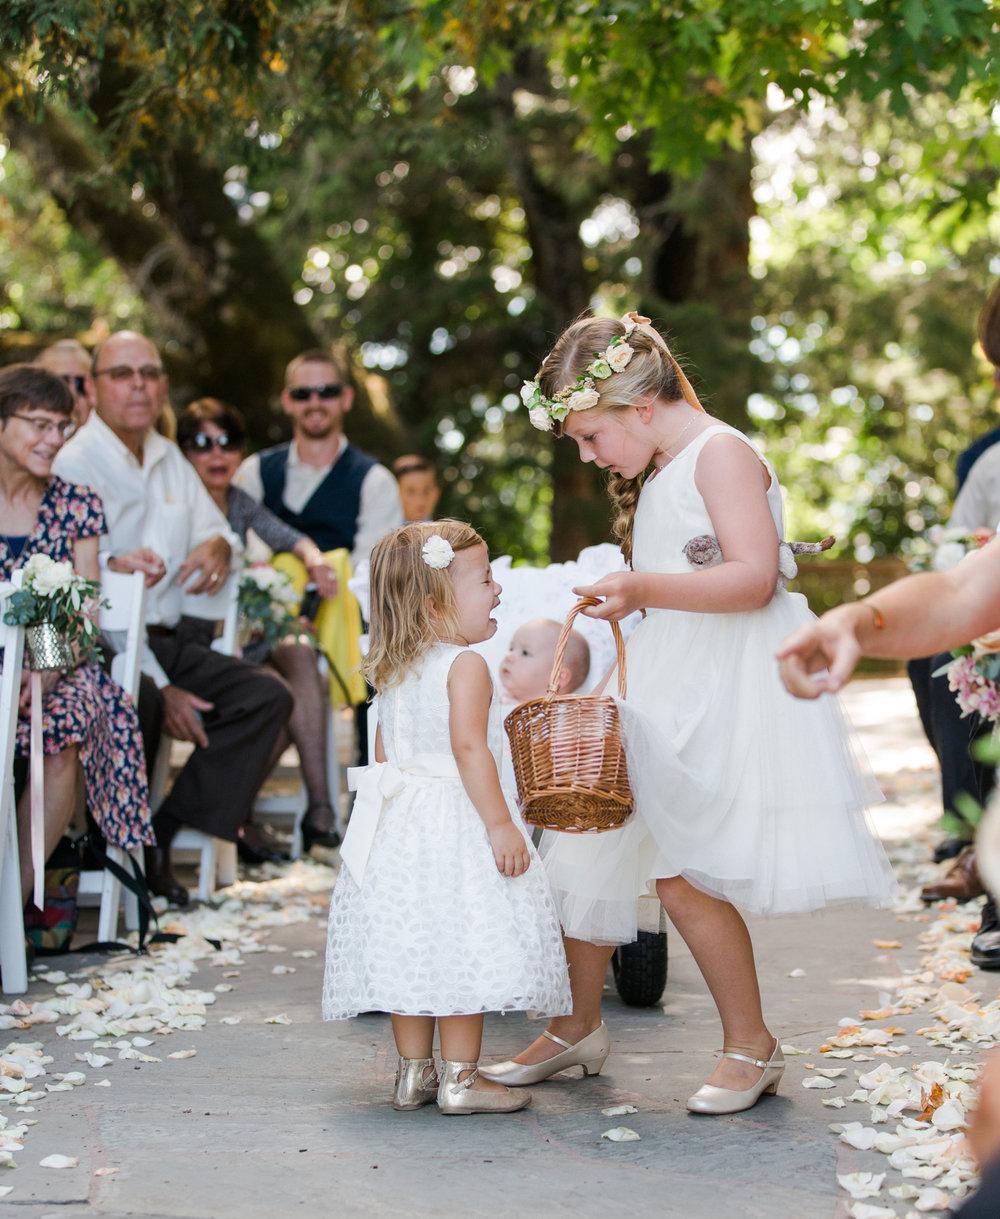 025_Vine_Hill_House_Wedding_Photographer.JPG